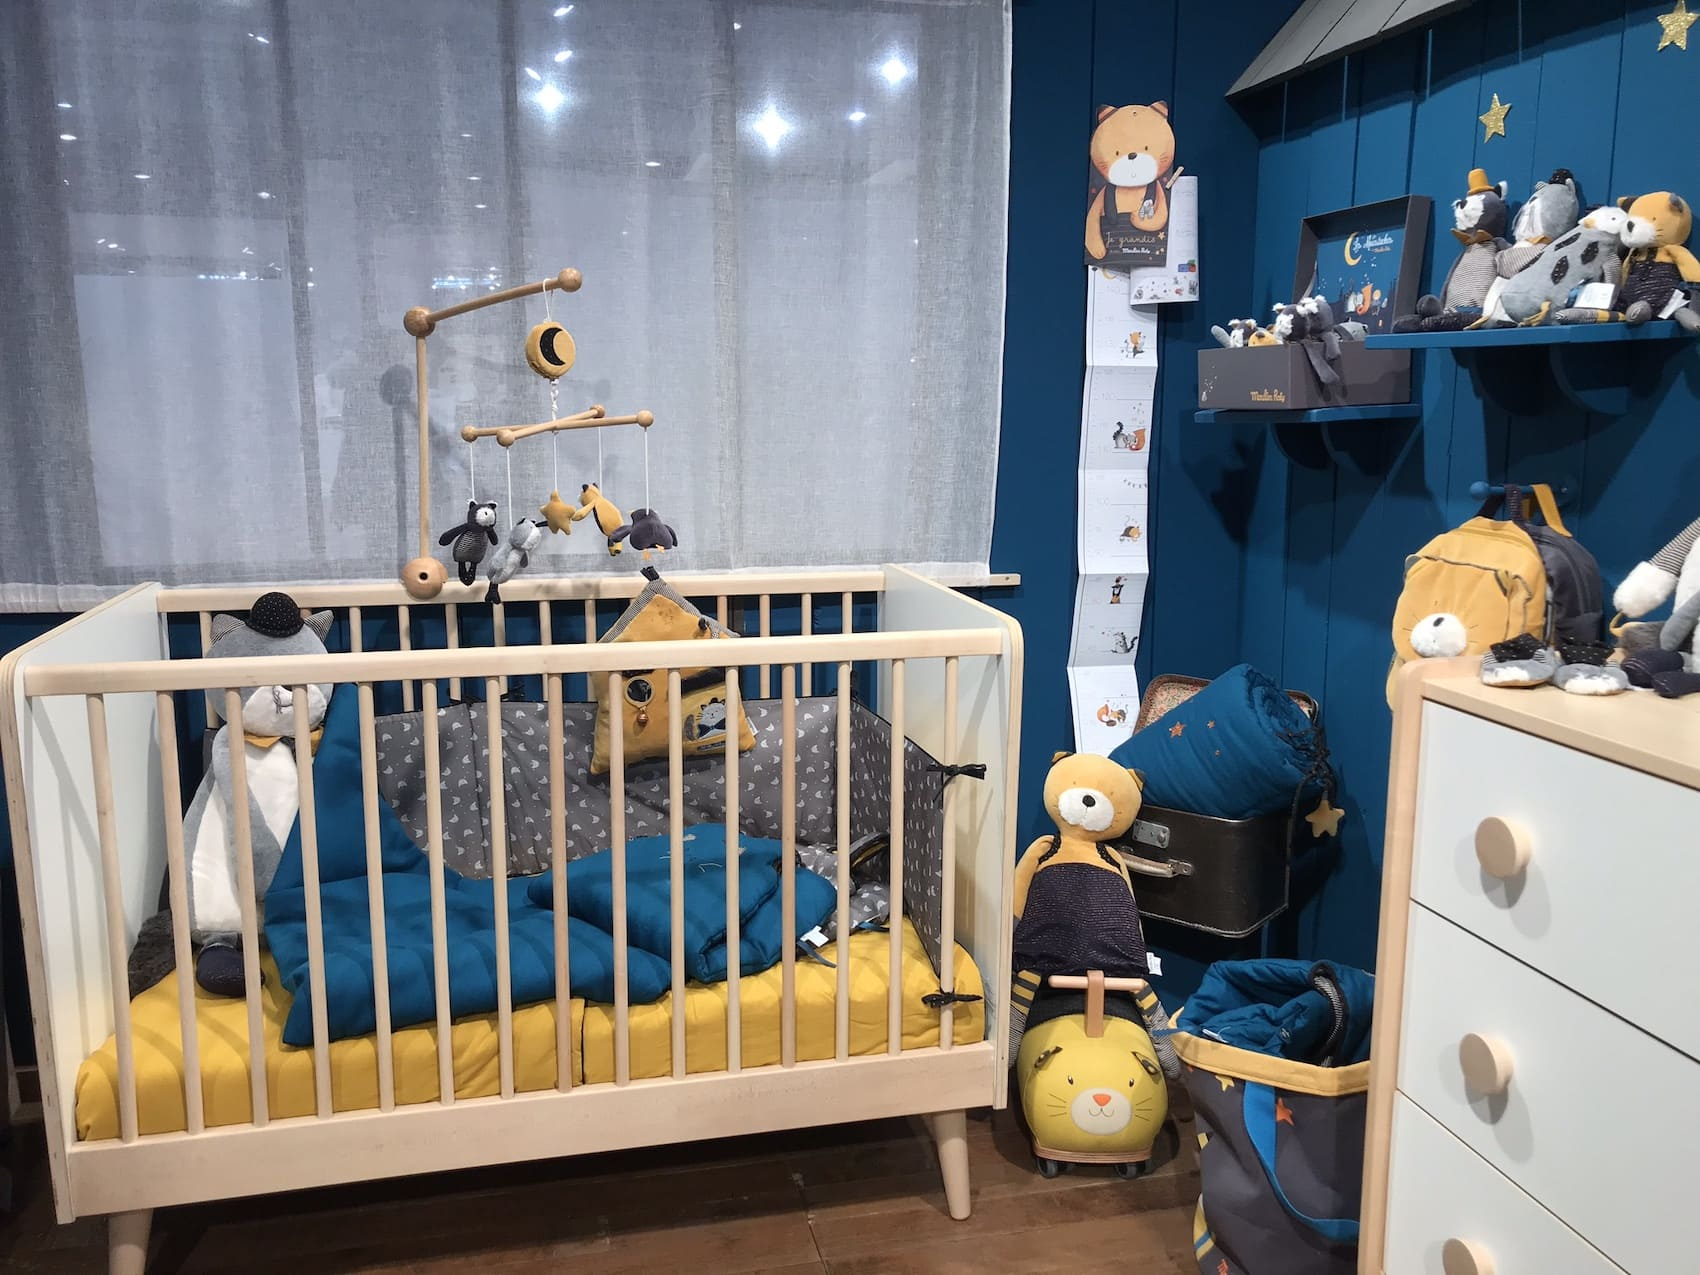 Maison & Objet 2019 Enfant - Moulin Roty